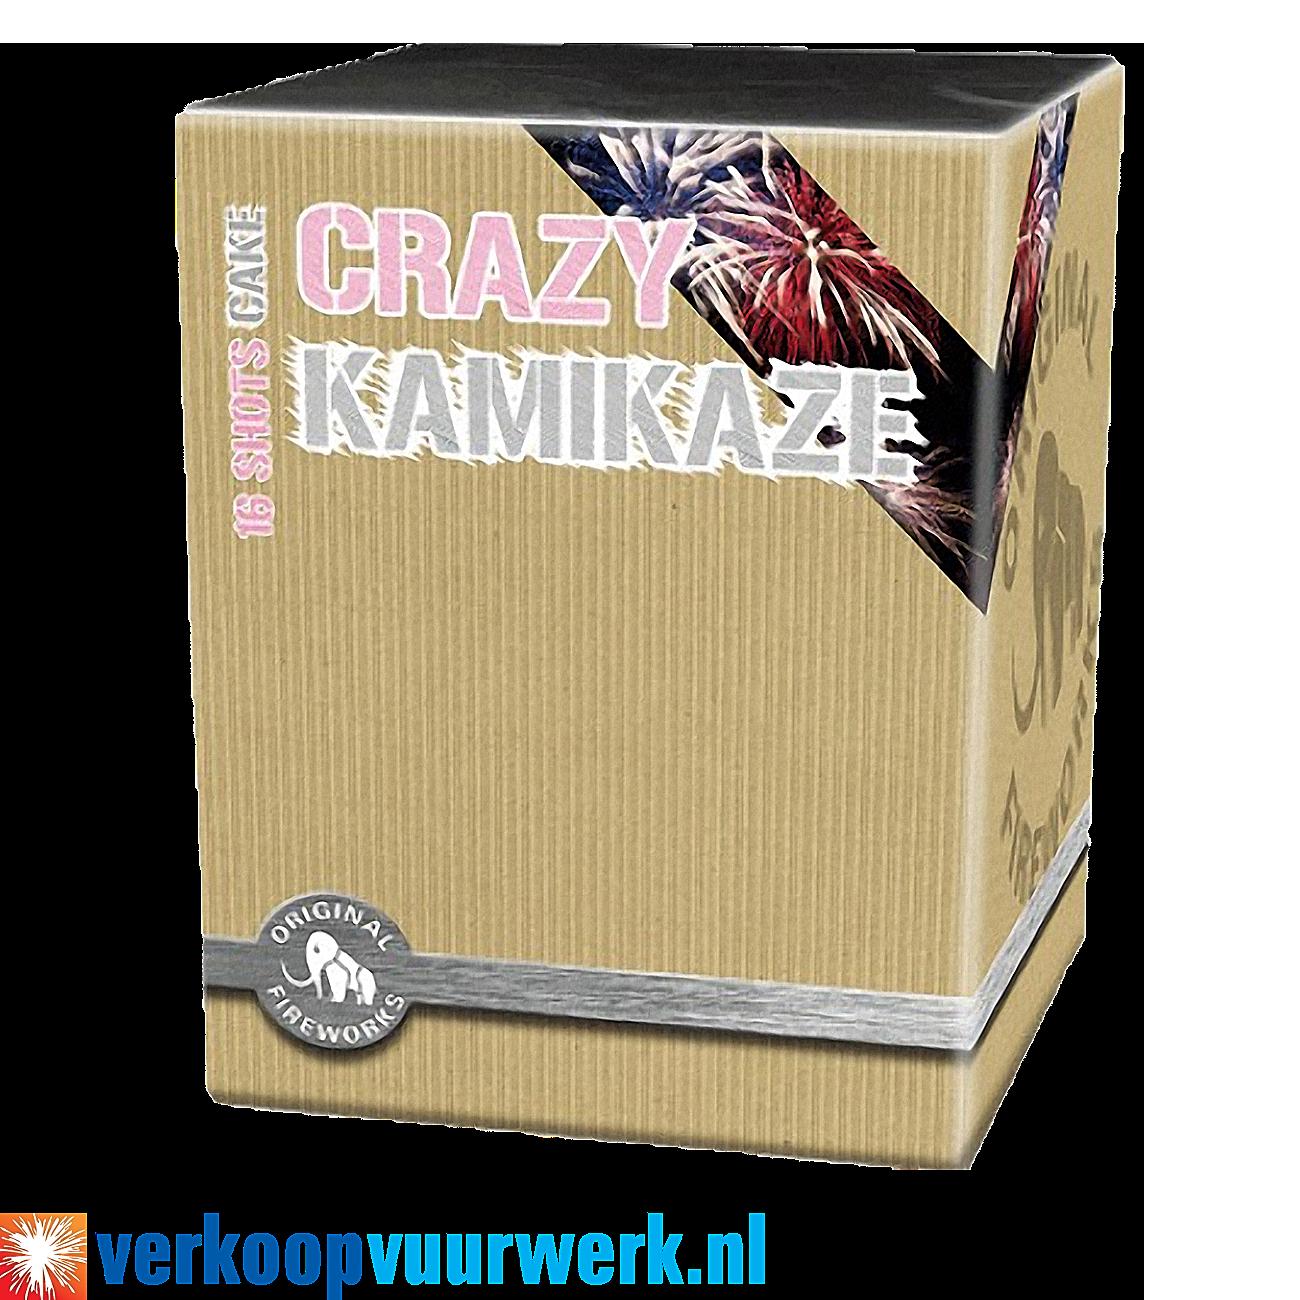 Crazy kamikaze